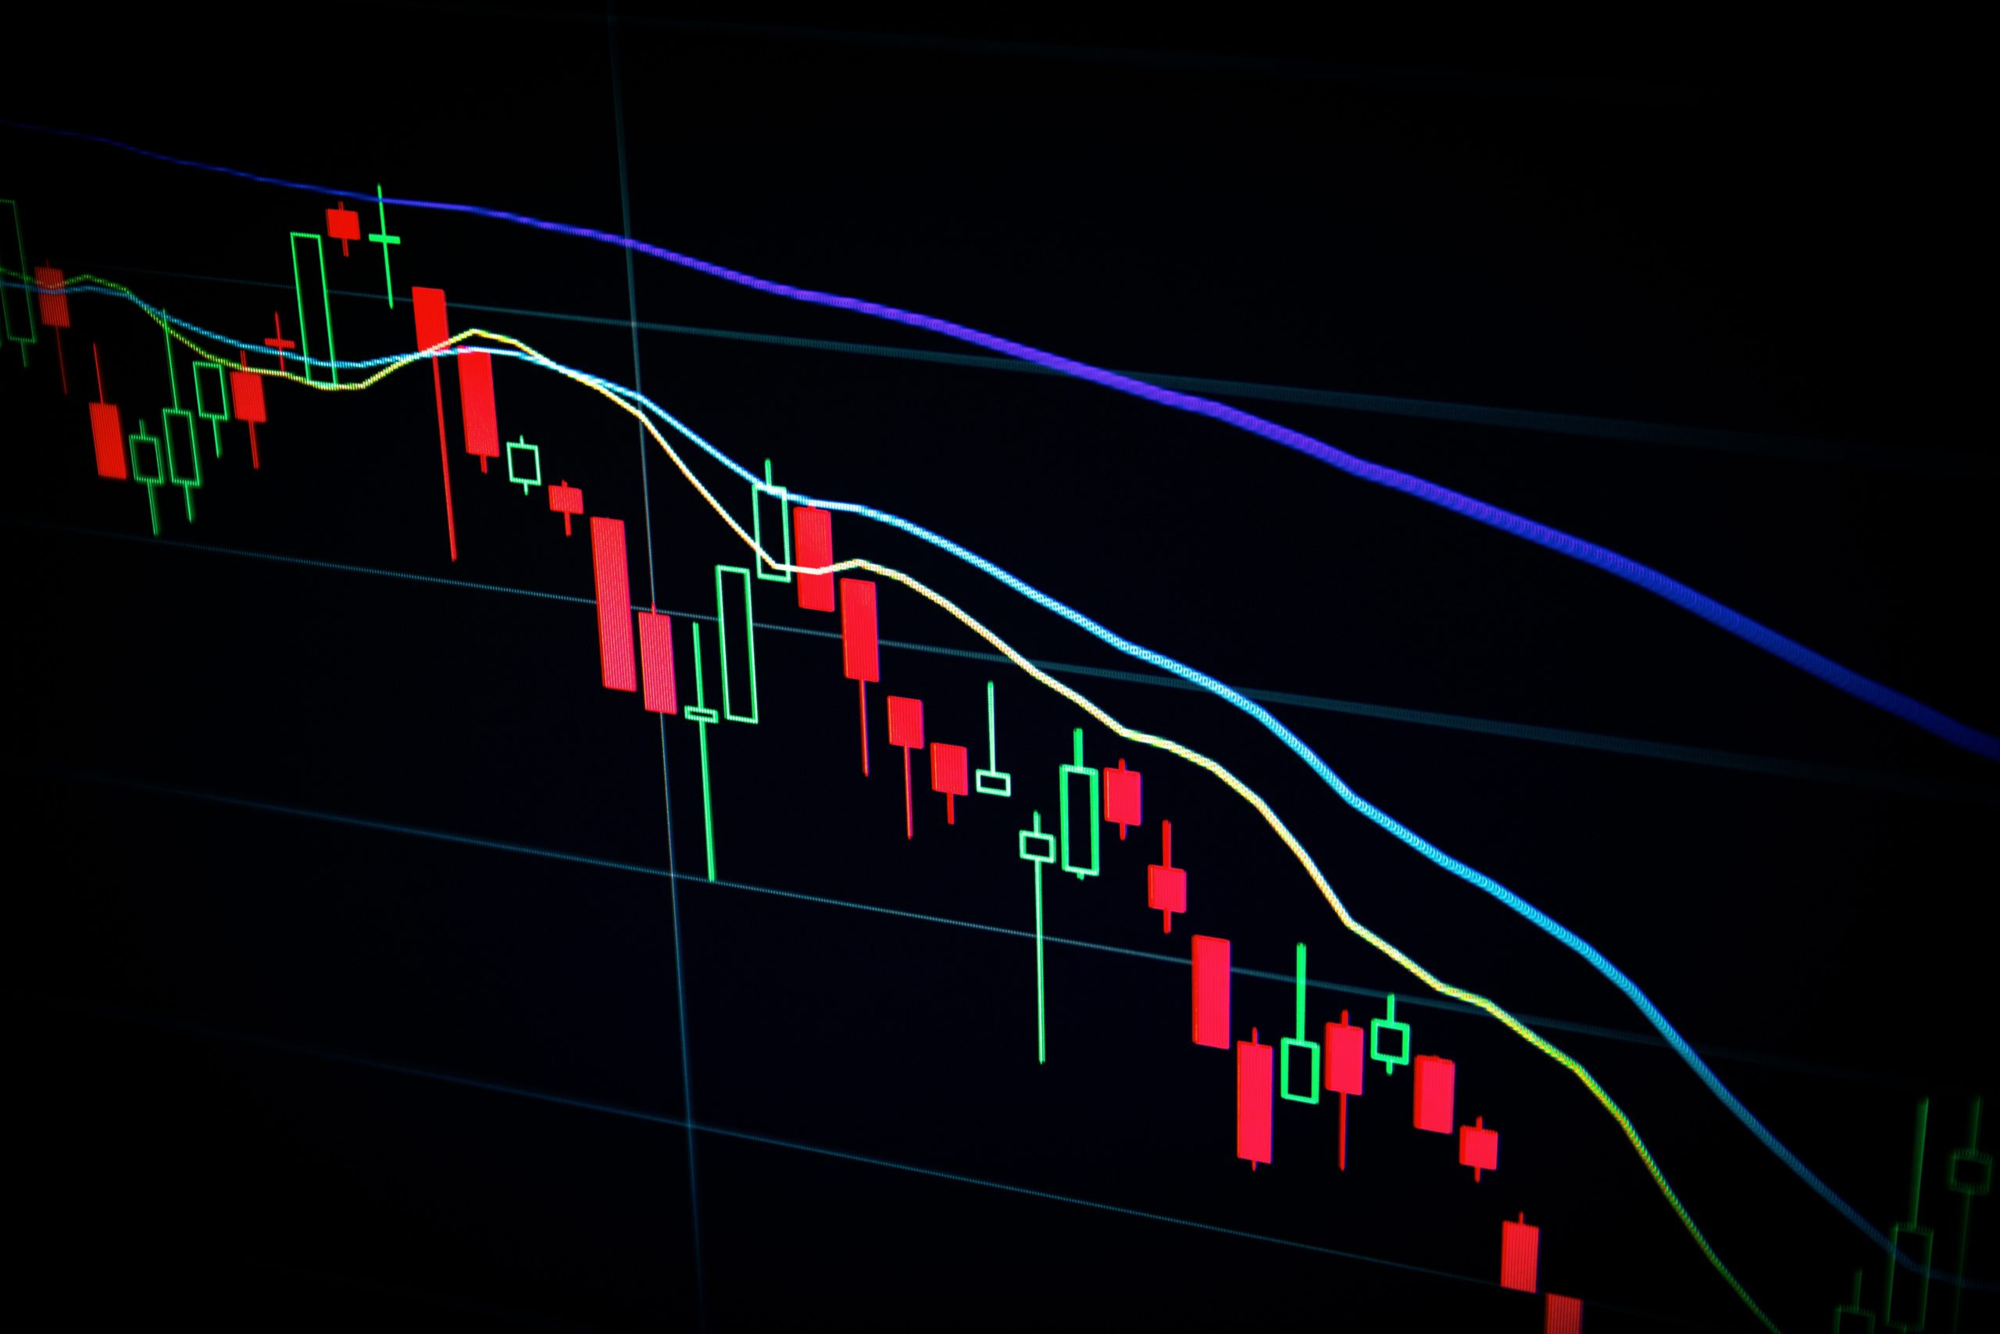 Sightline Weekly Market Update: Slowing Economic Growth, Delta Variant Push Markets Lower